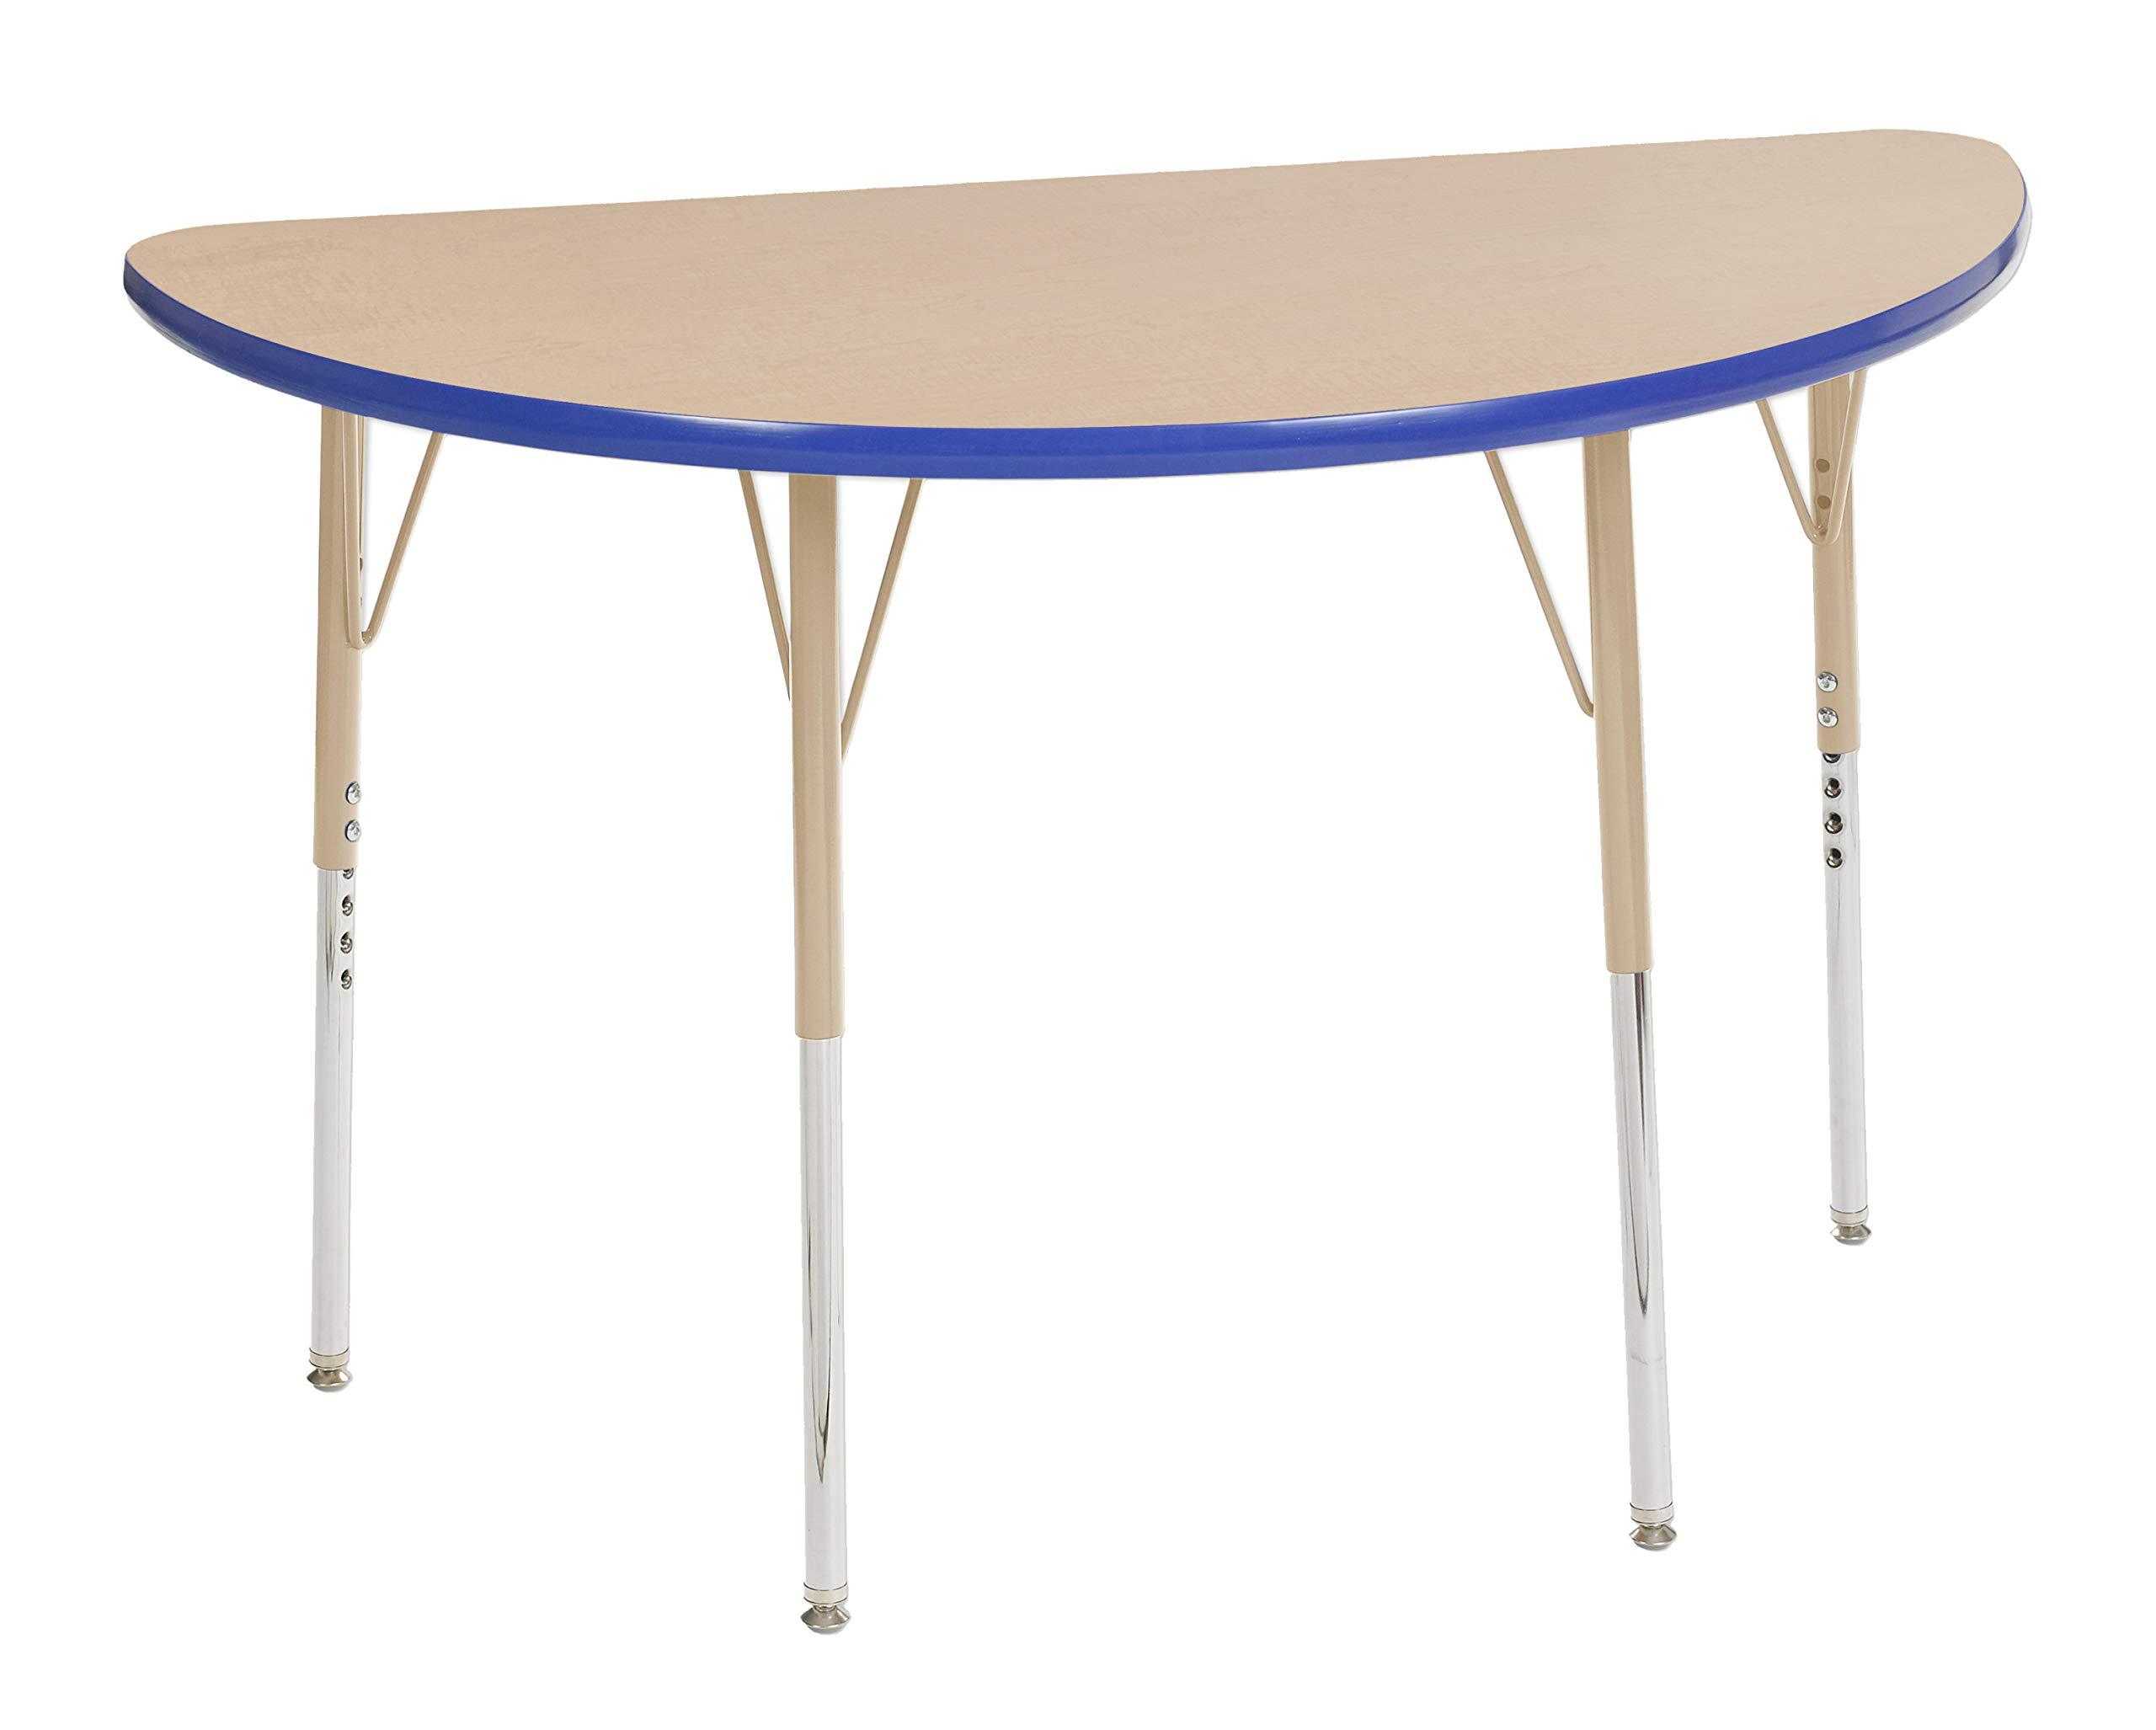 ECR4Kids Mesa Premium 24'' x 48'' Half Round School Activity Table, Standard Legs w/Swivel Glides, Adjustable Height 19-30 inch (Maple/Blue/Sand)